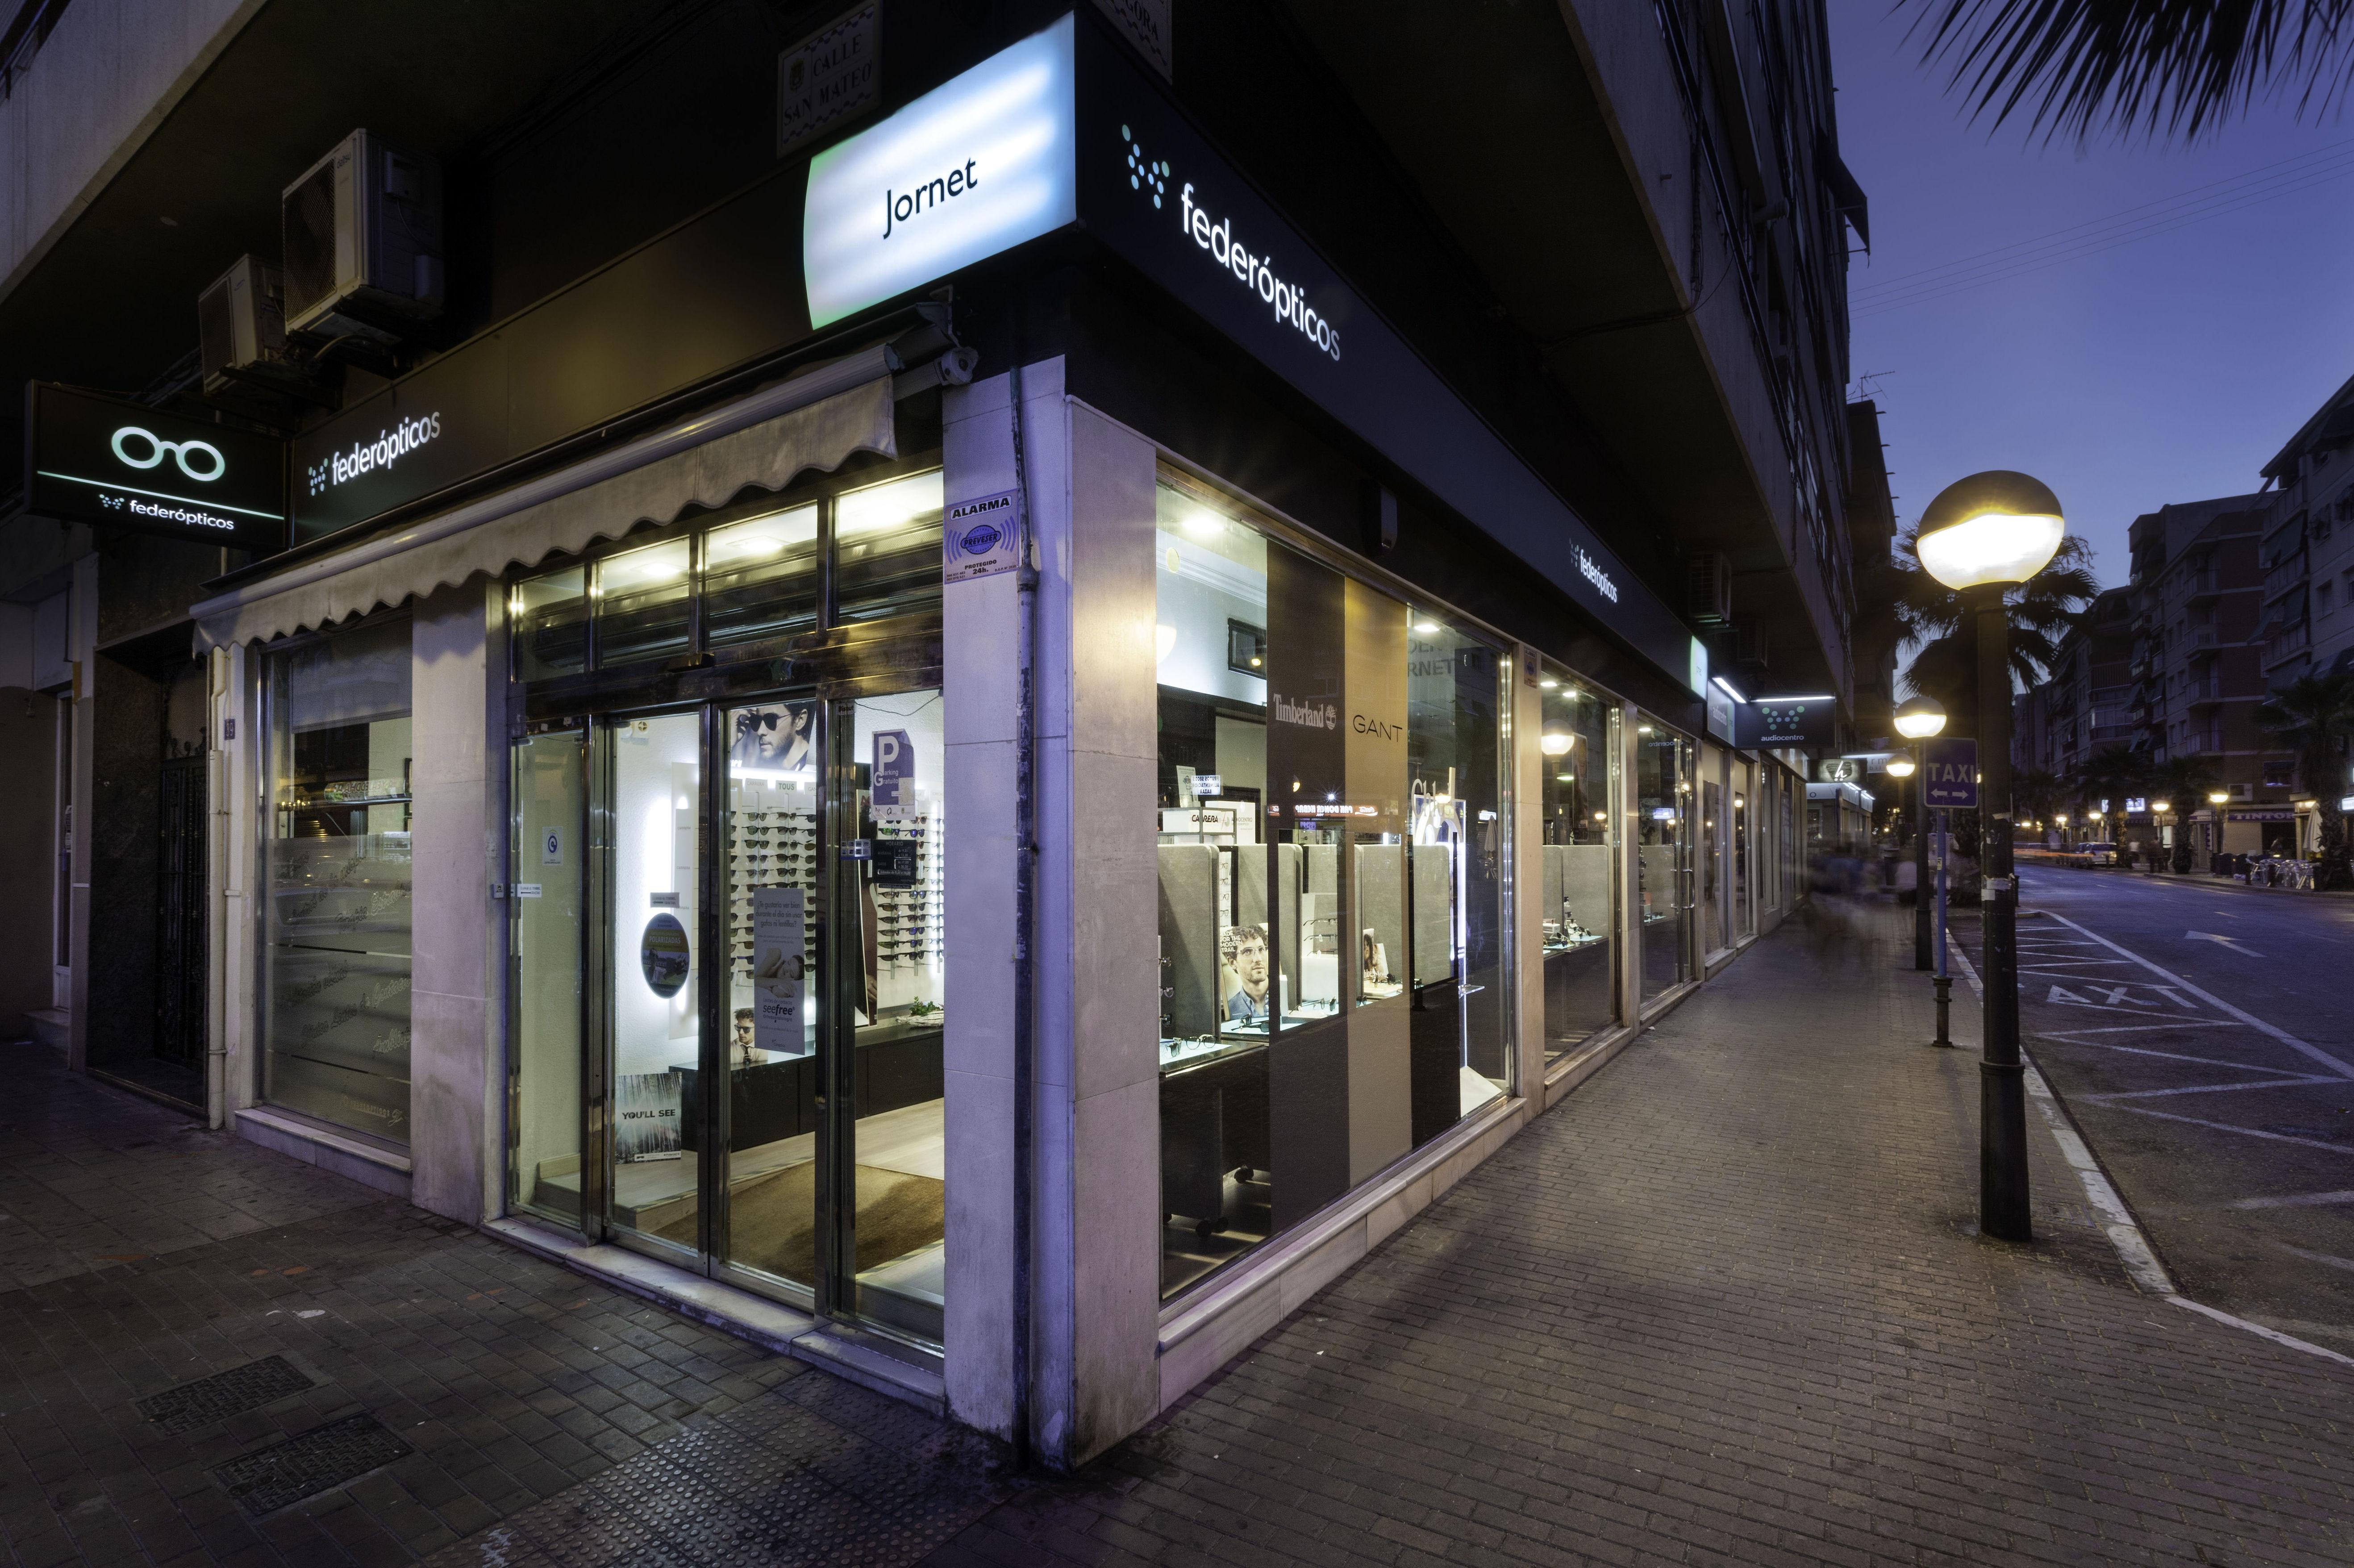 Foto 1 de Ópticas en Alicante | Federópticos Jornet